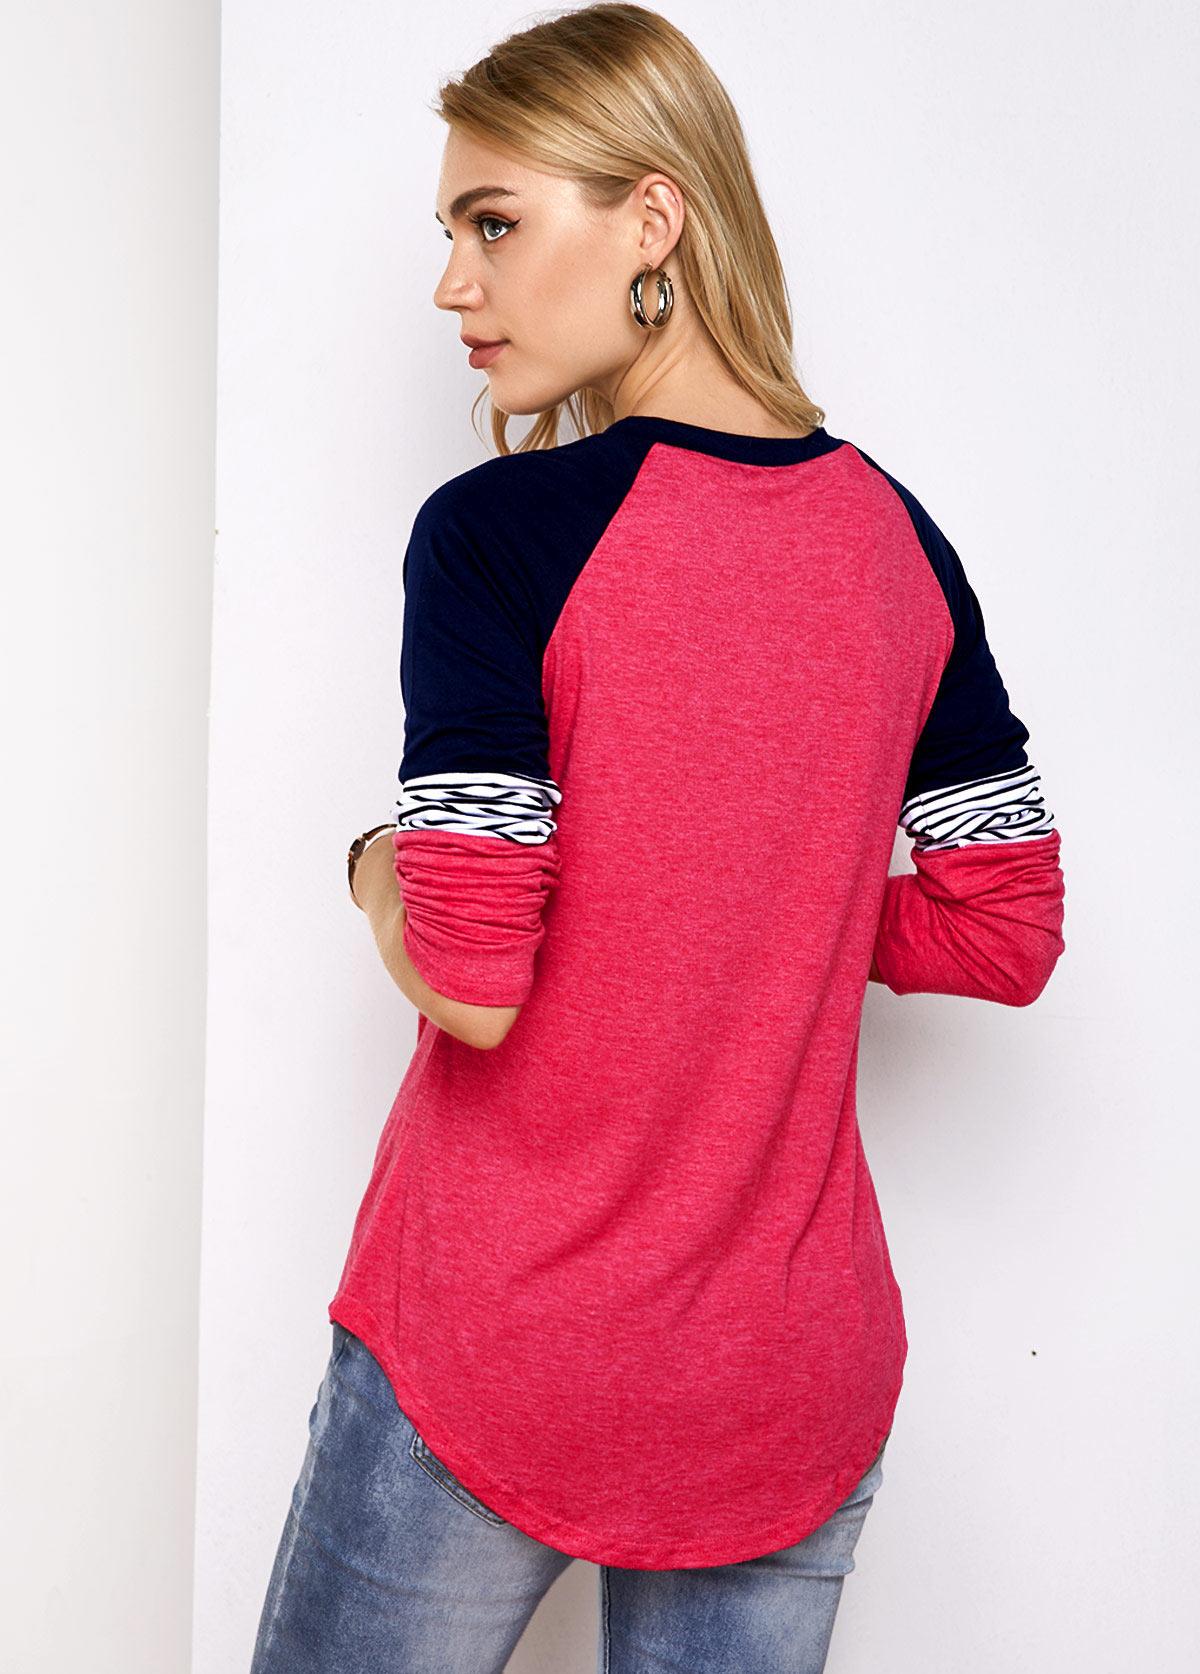 Contrast Round Neck Stripe Print T Shirt